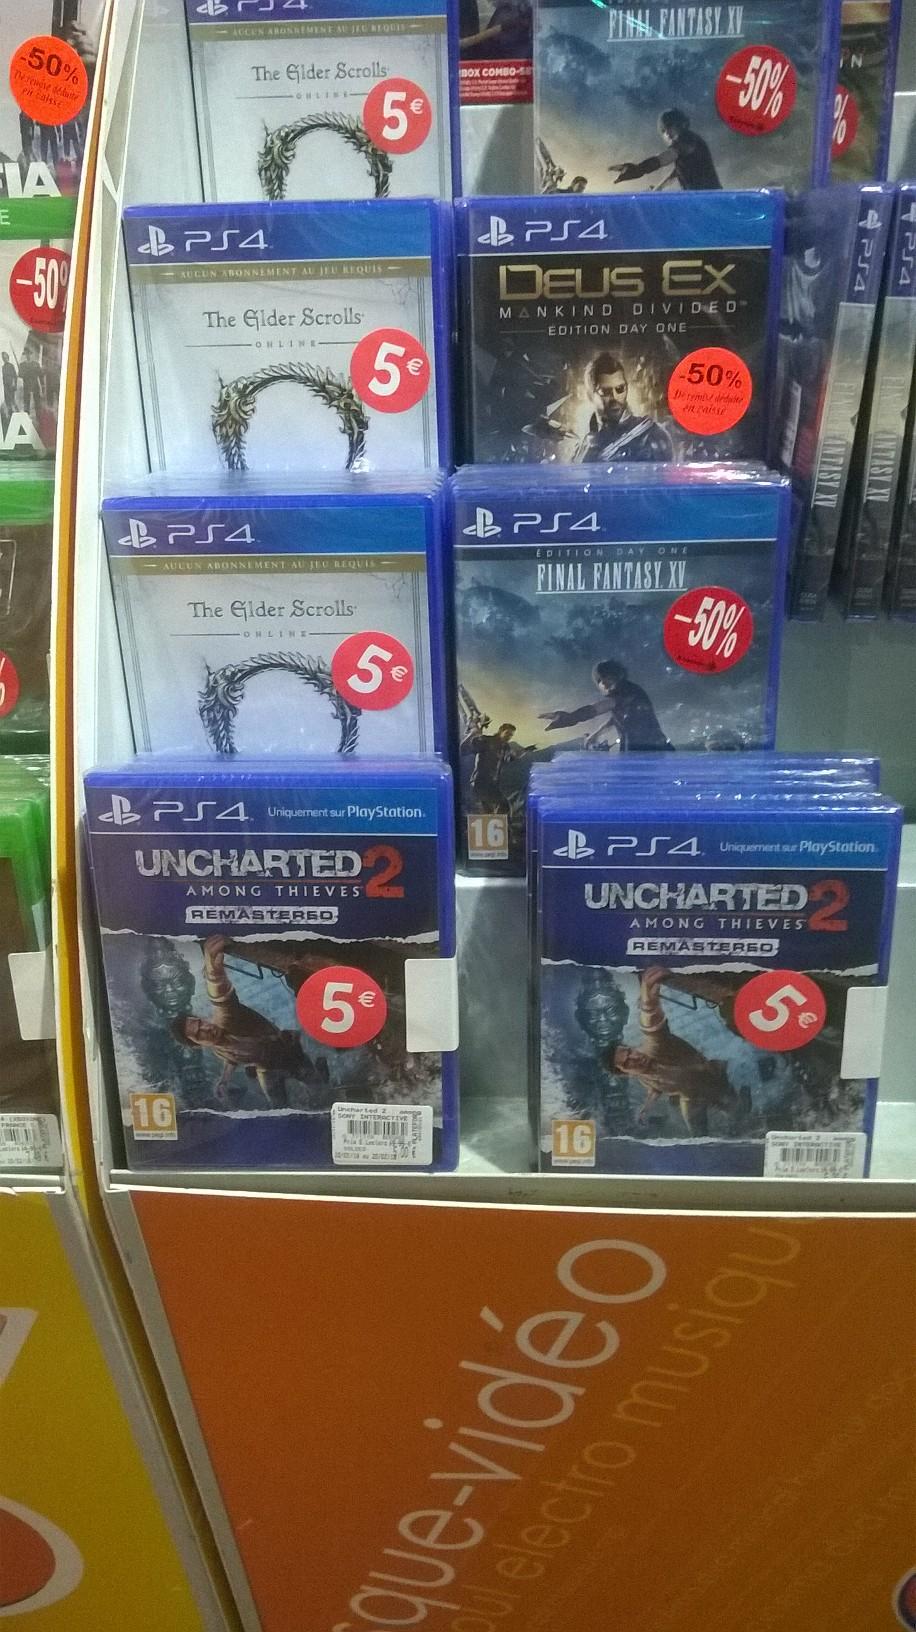 Jeu Uncharted 2 : Among Thieves sur PS4 - Olivet(45)